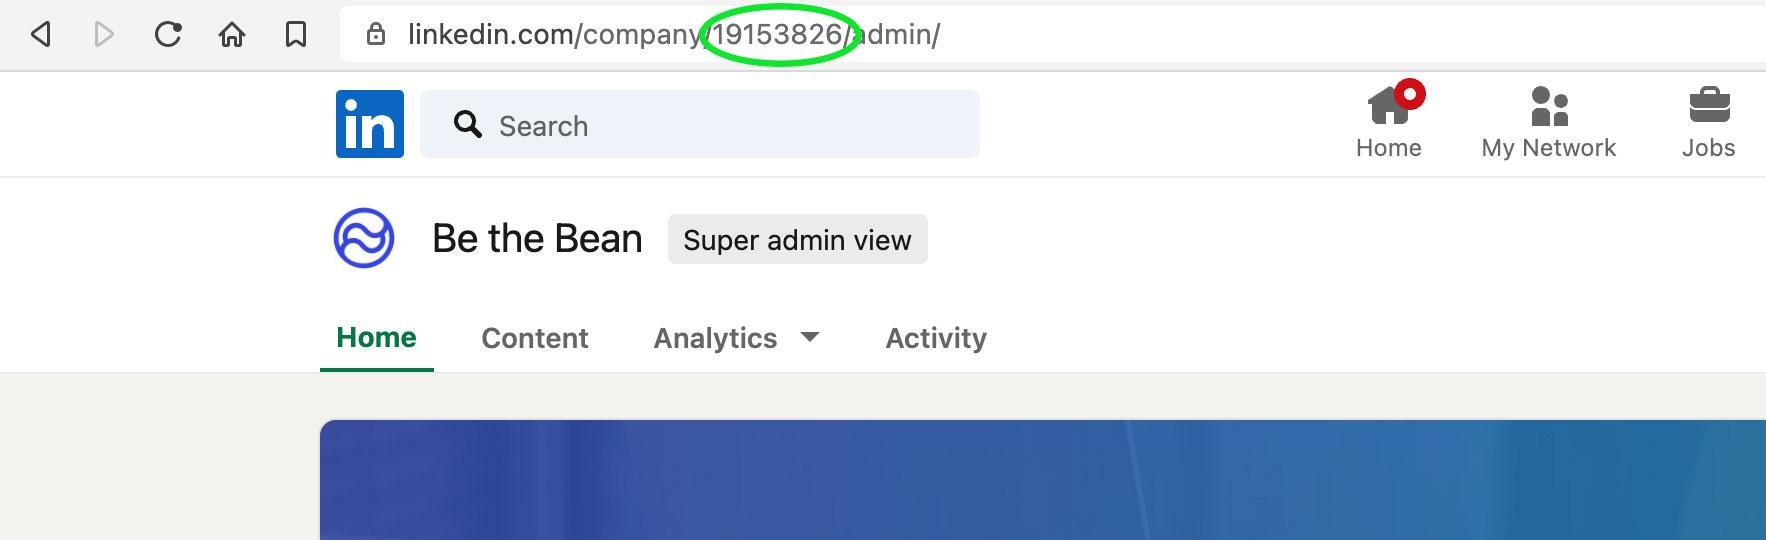 linkedin company id